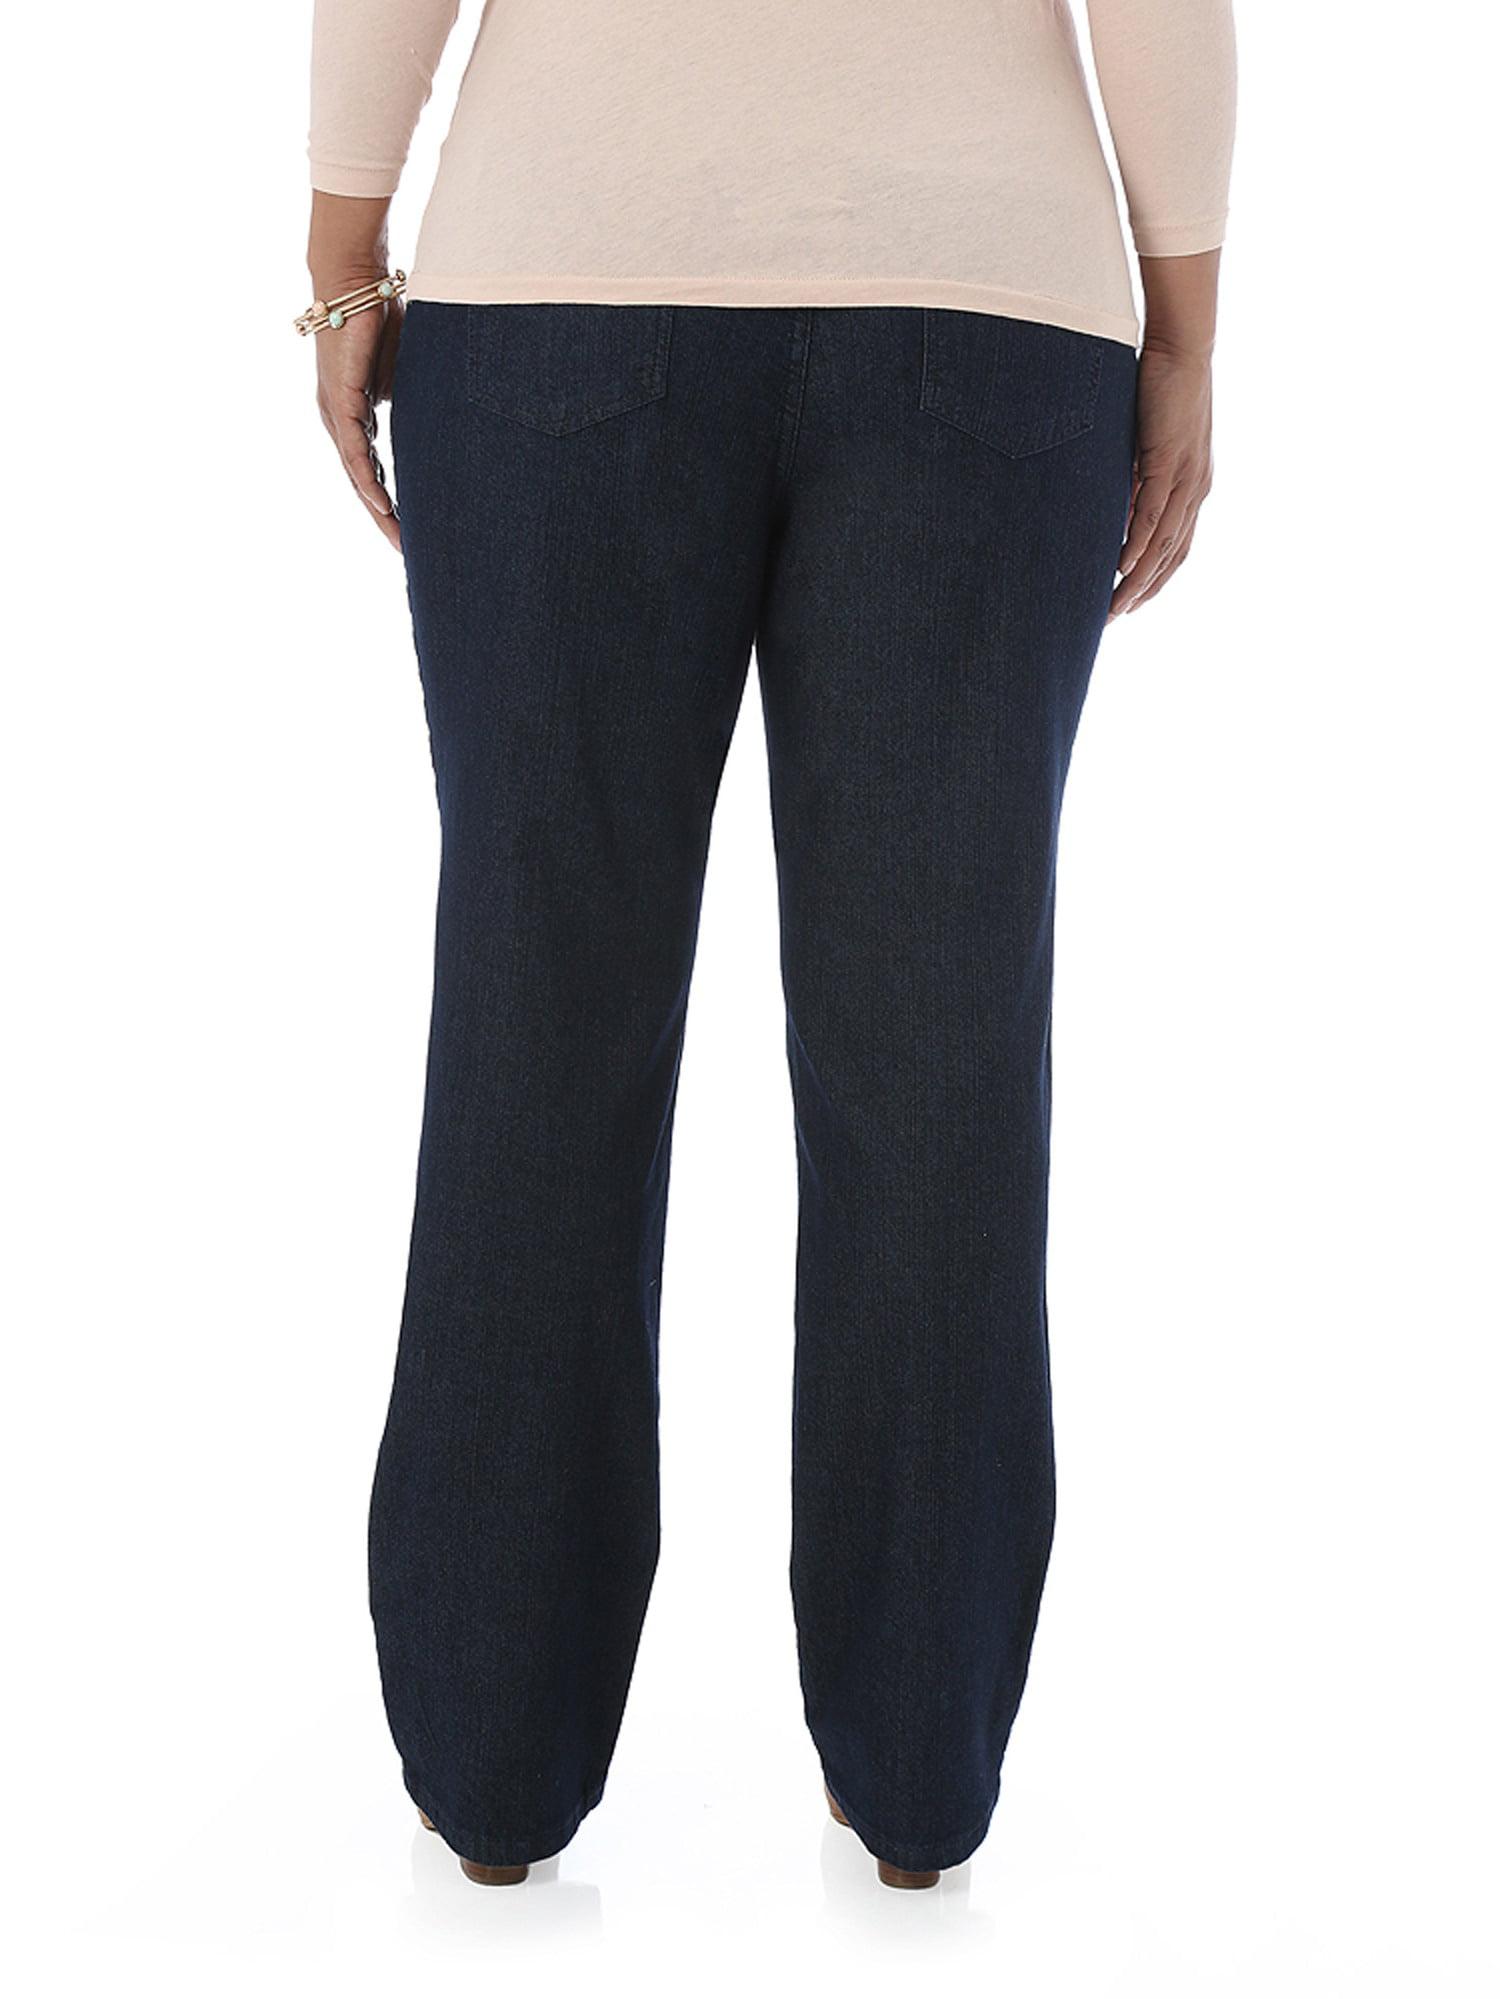 34a3fd0b Riders by Lee - Women's Plus-Size Simply Comfort Waist Straight Leg Jeans -  Walmart.com